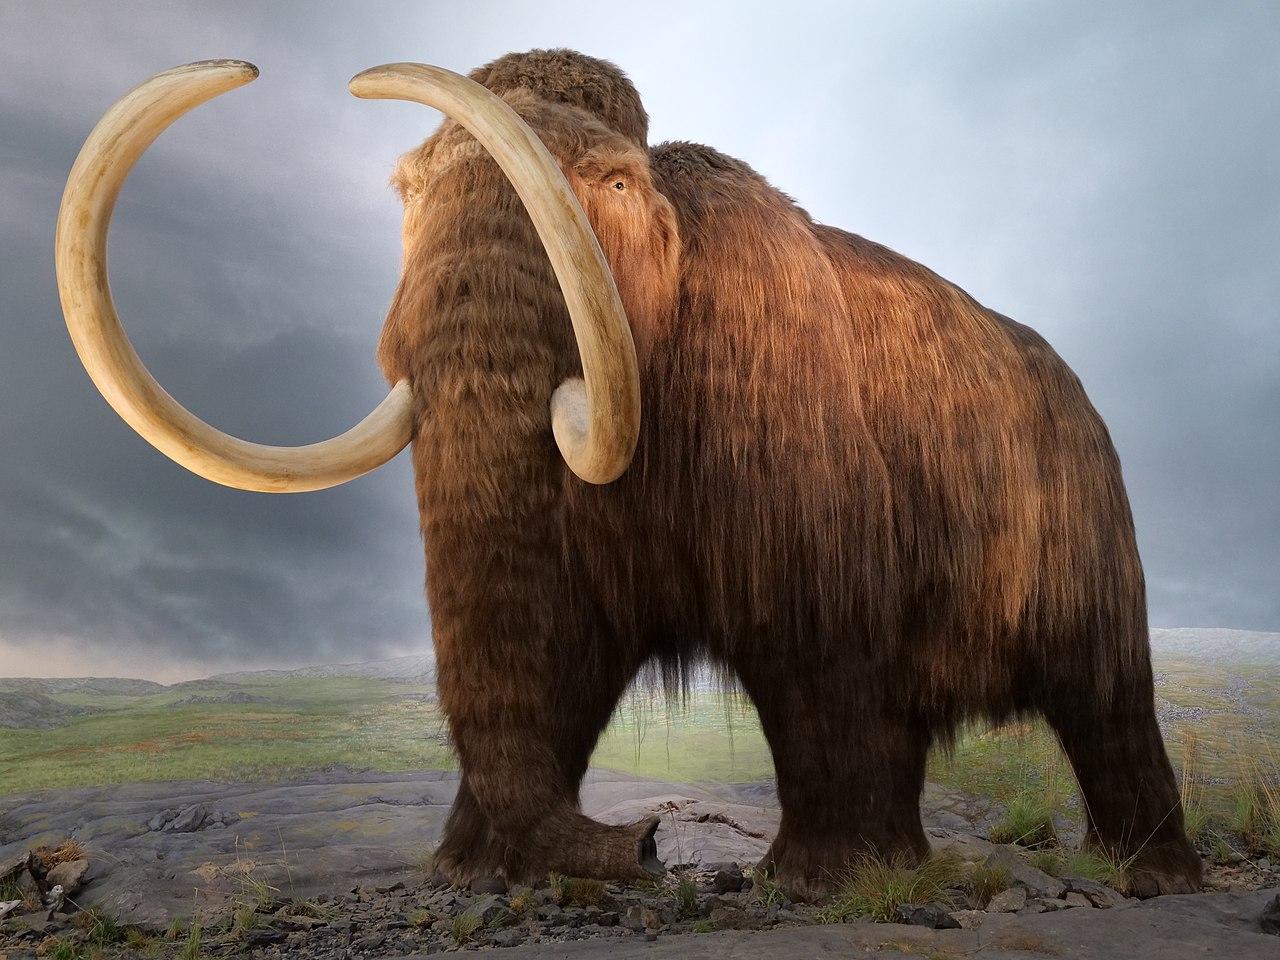 https://upload.wikimedia.org/wikipedia/commons/thumb/b/ba/Victoria.Mammut.P1033804.jpg/1280px-Victoria.Mammut.P1033804.jpg